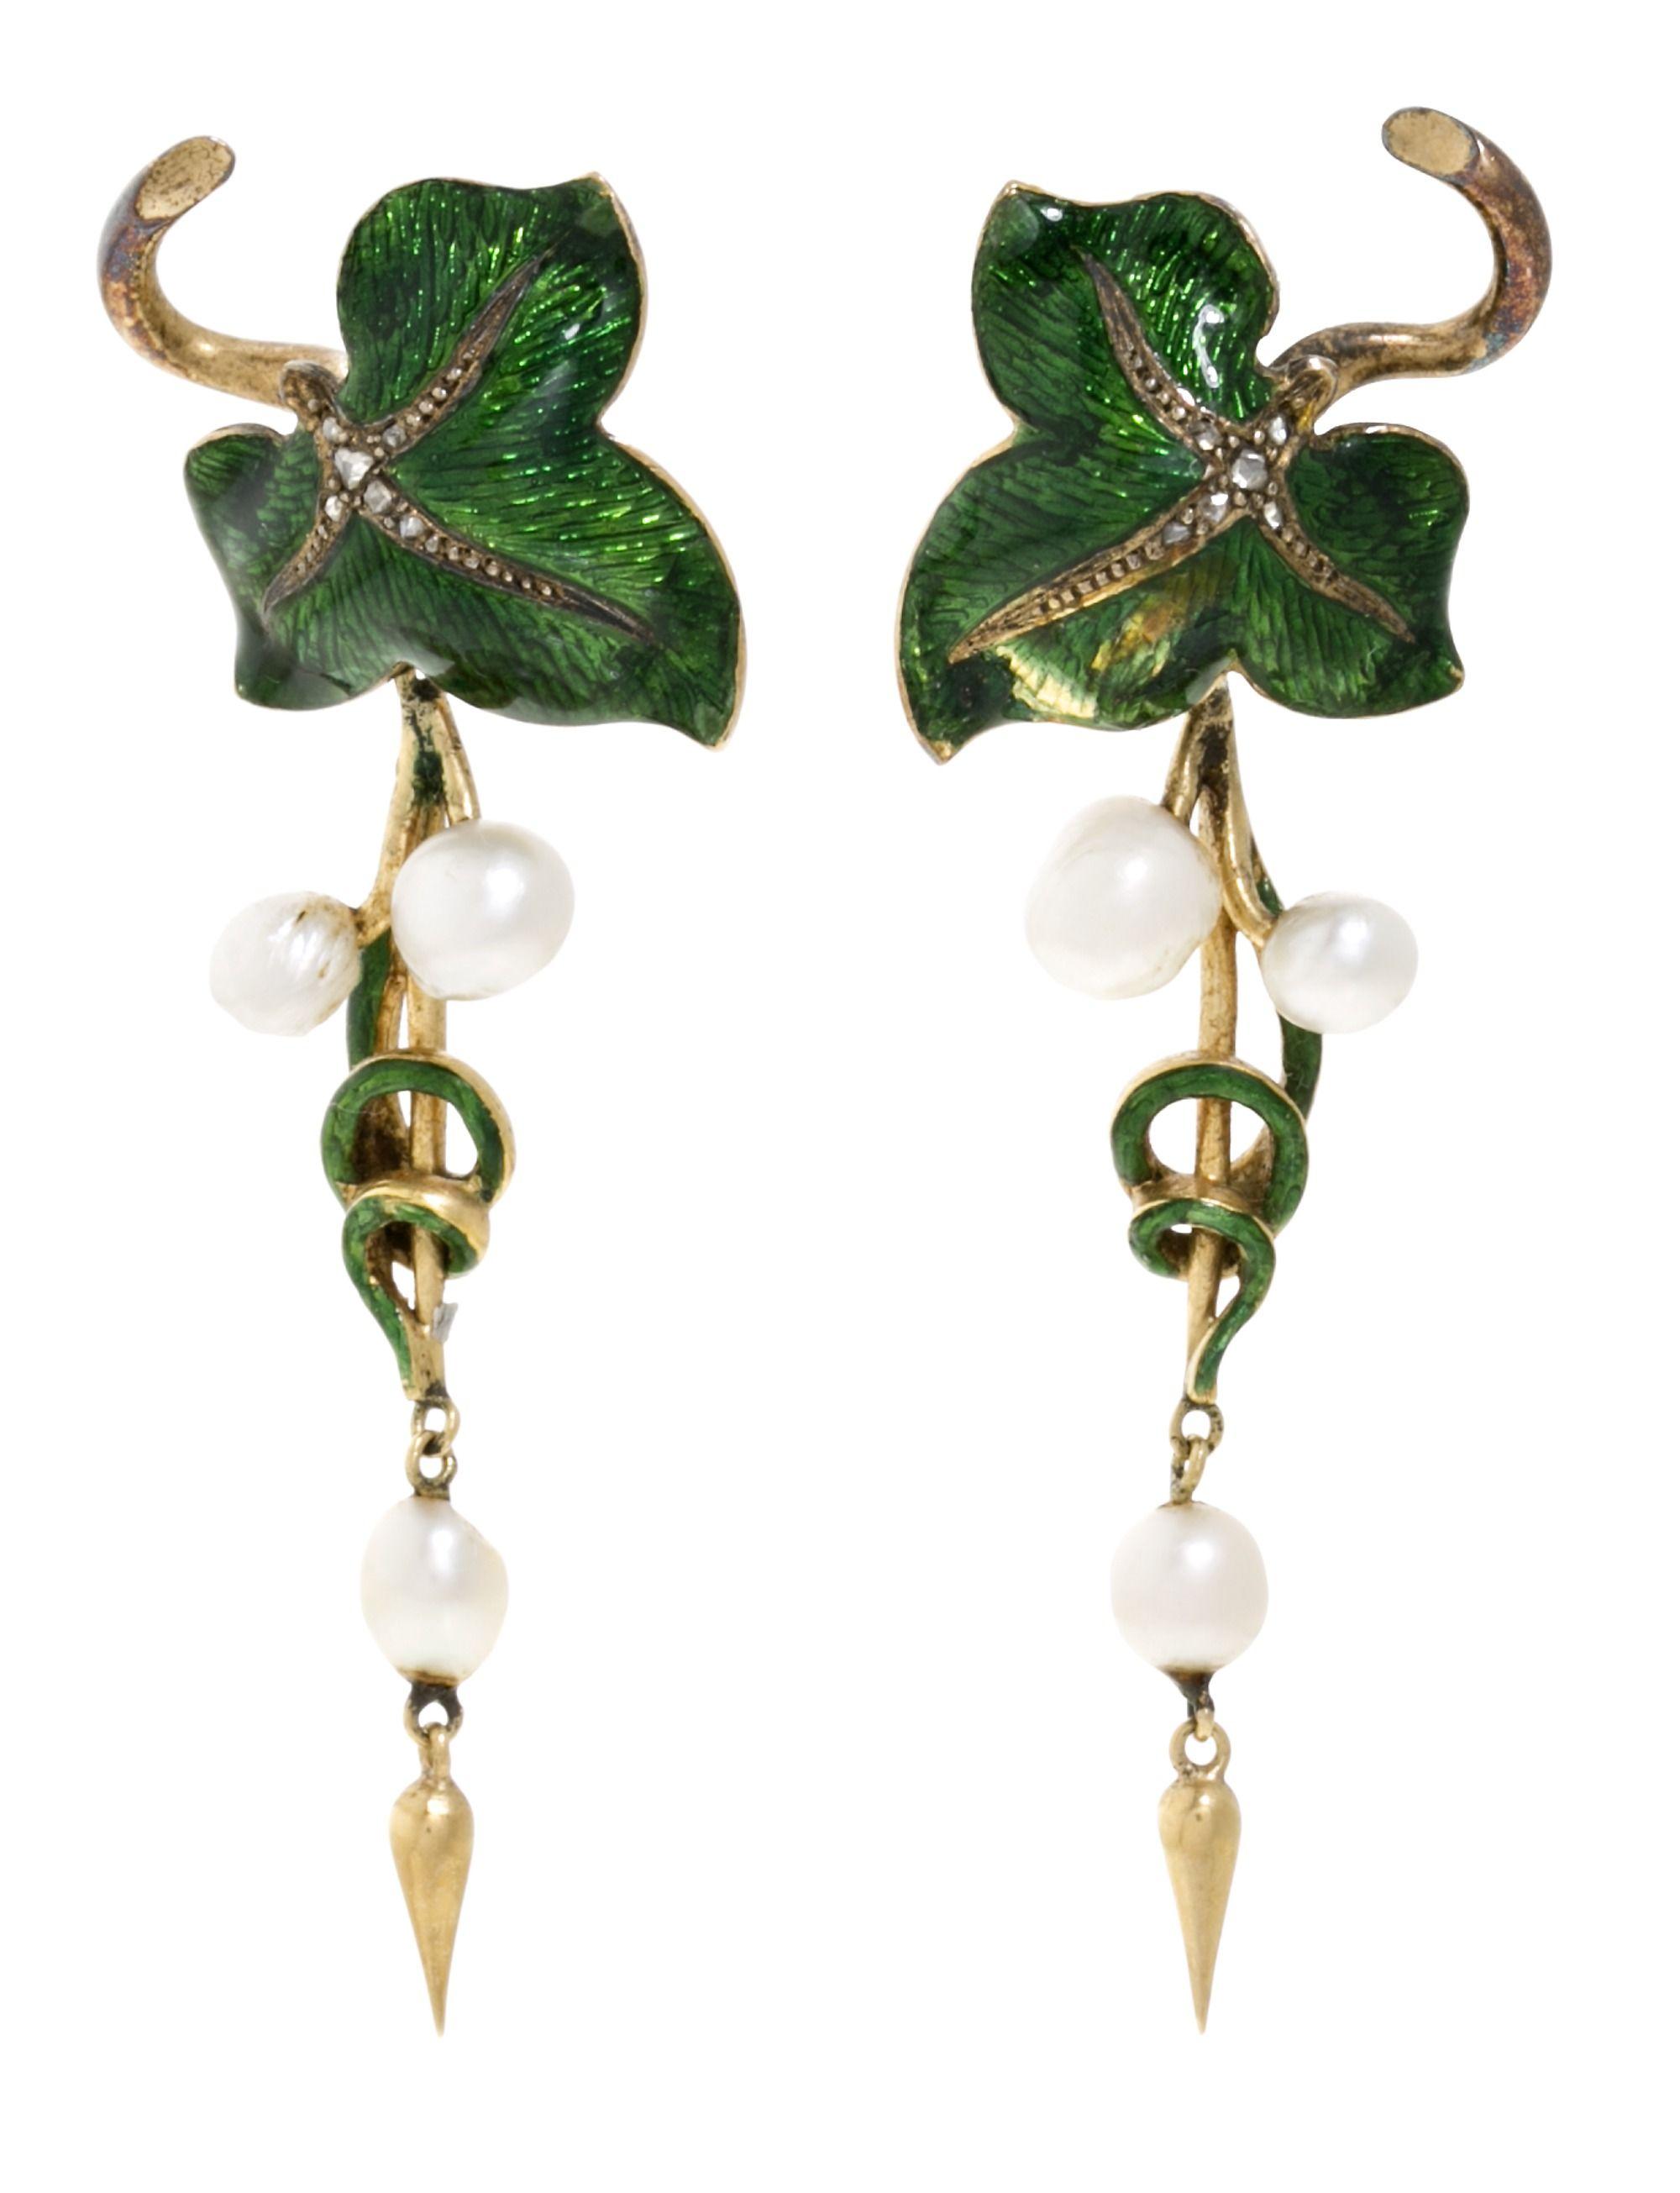 Crazy big savings on stunning jewelry at jewelrydealsnow